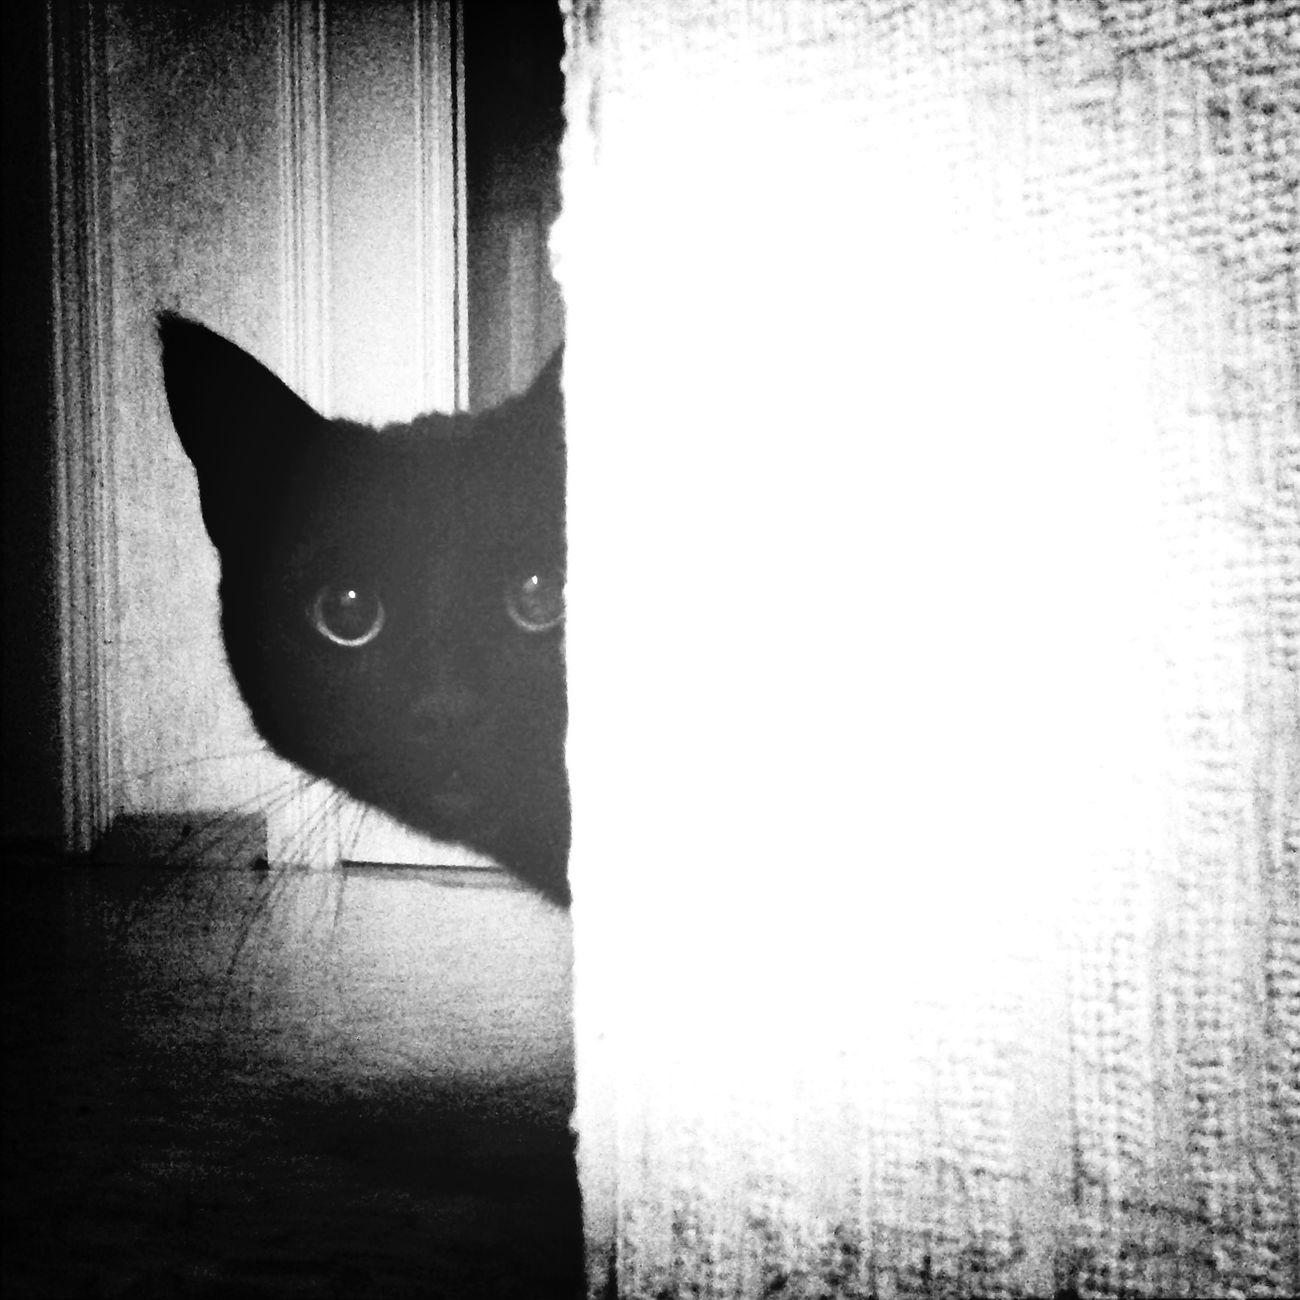 Dark Lord Black Cat Cat Plutón I Love My Cat